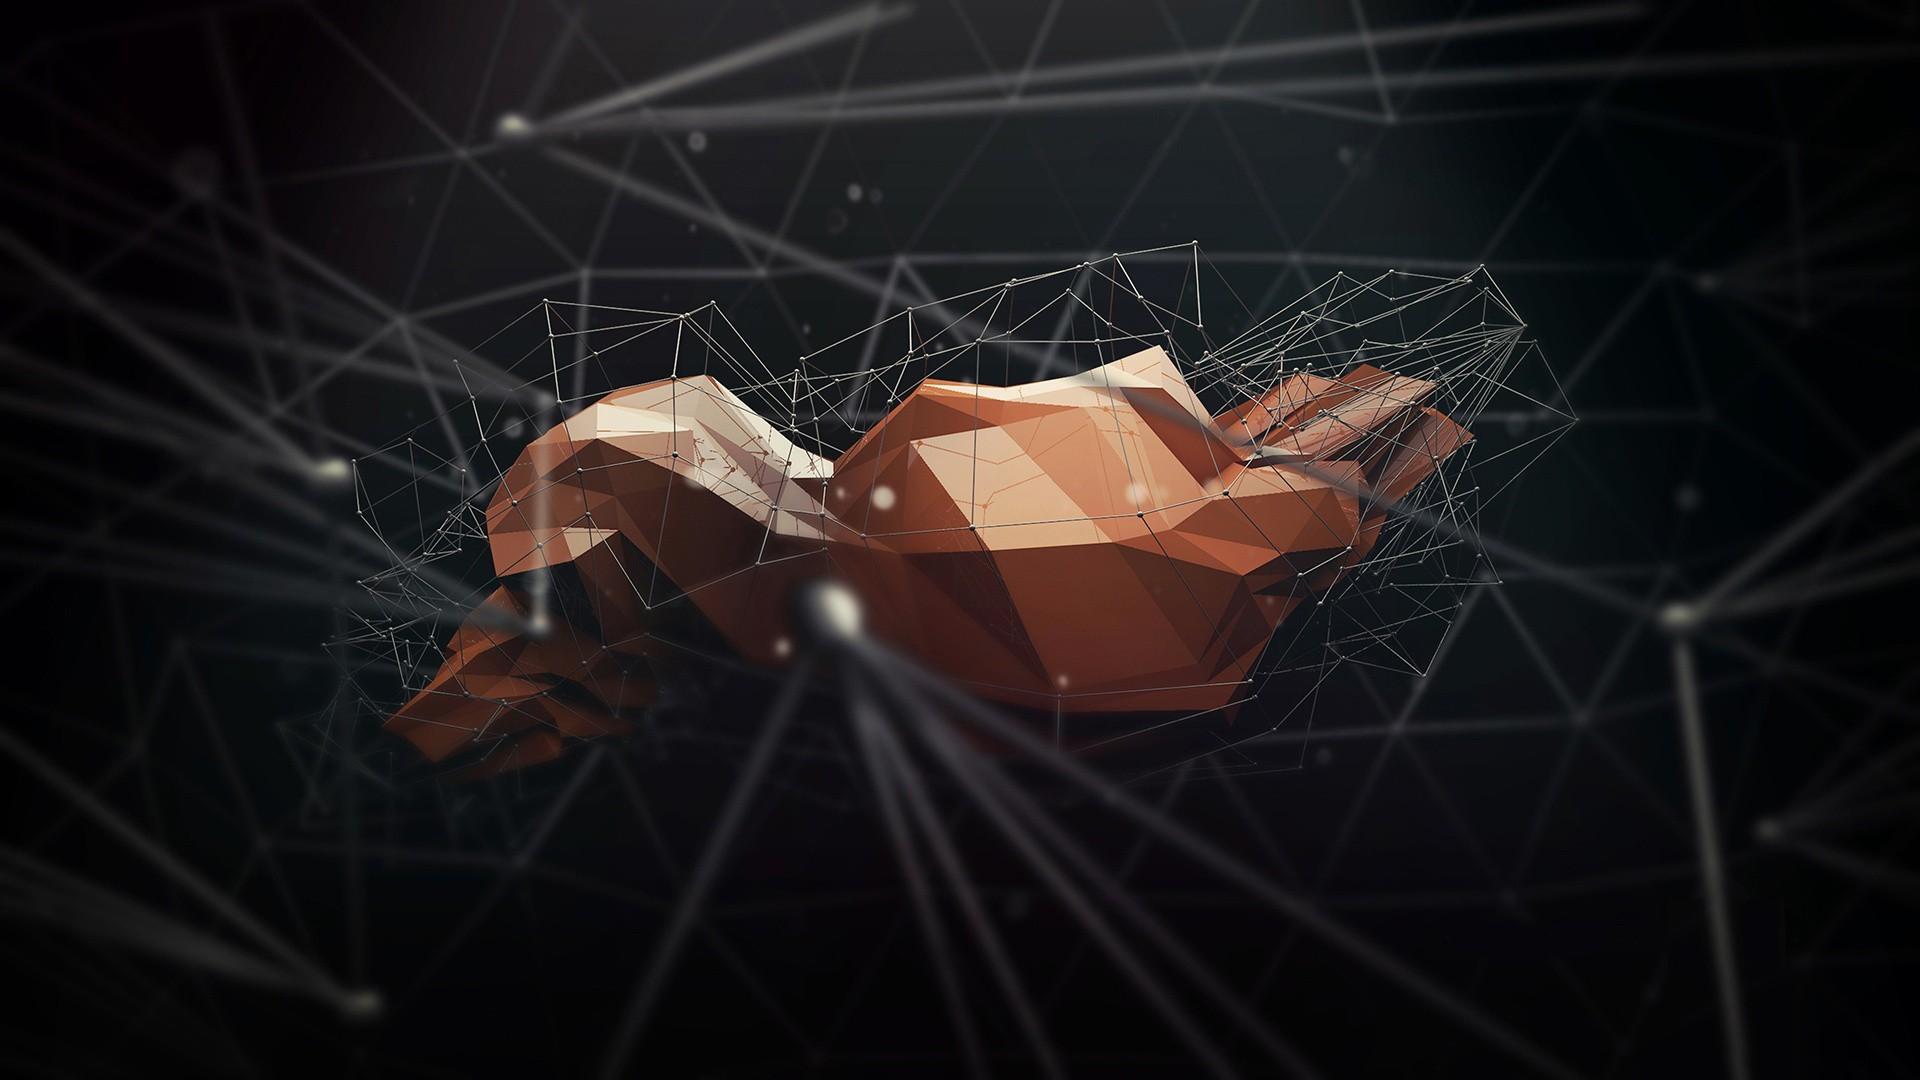 Polygon Art Abstract a wallpaper | | 80615 | WallpaperUP